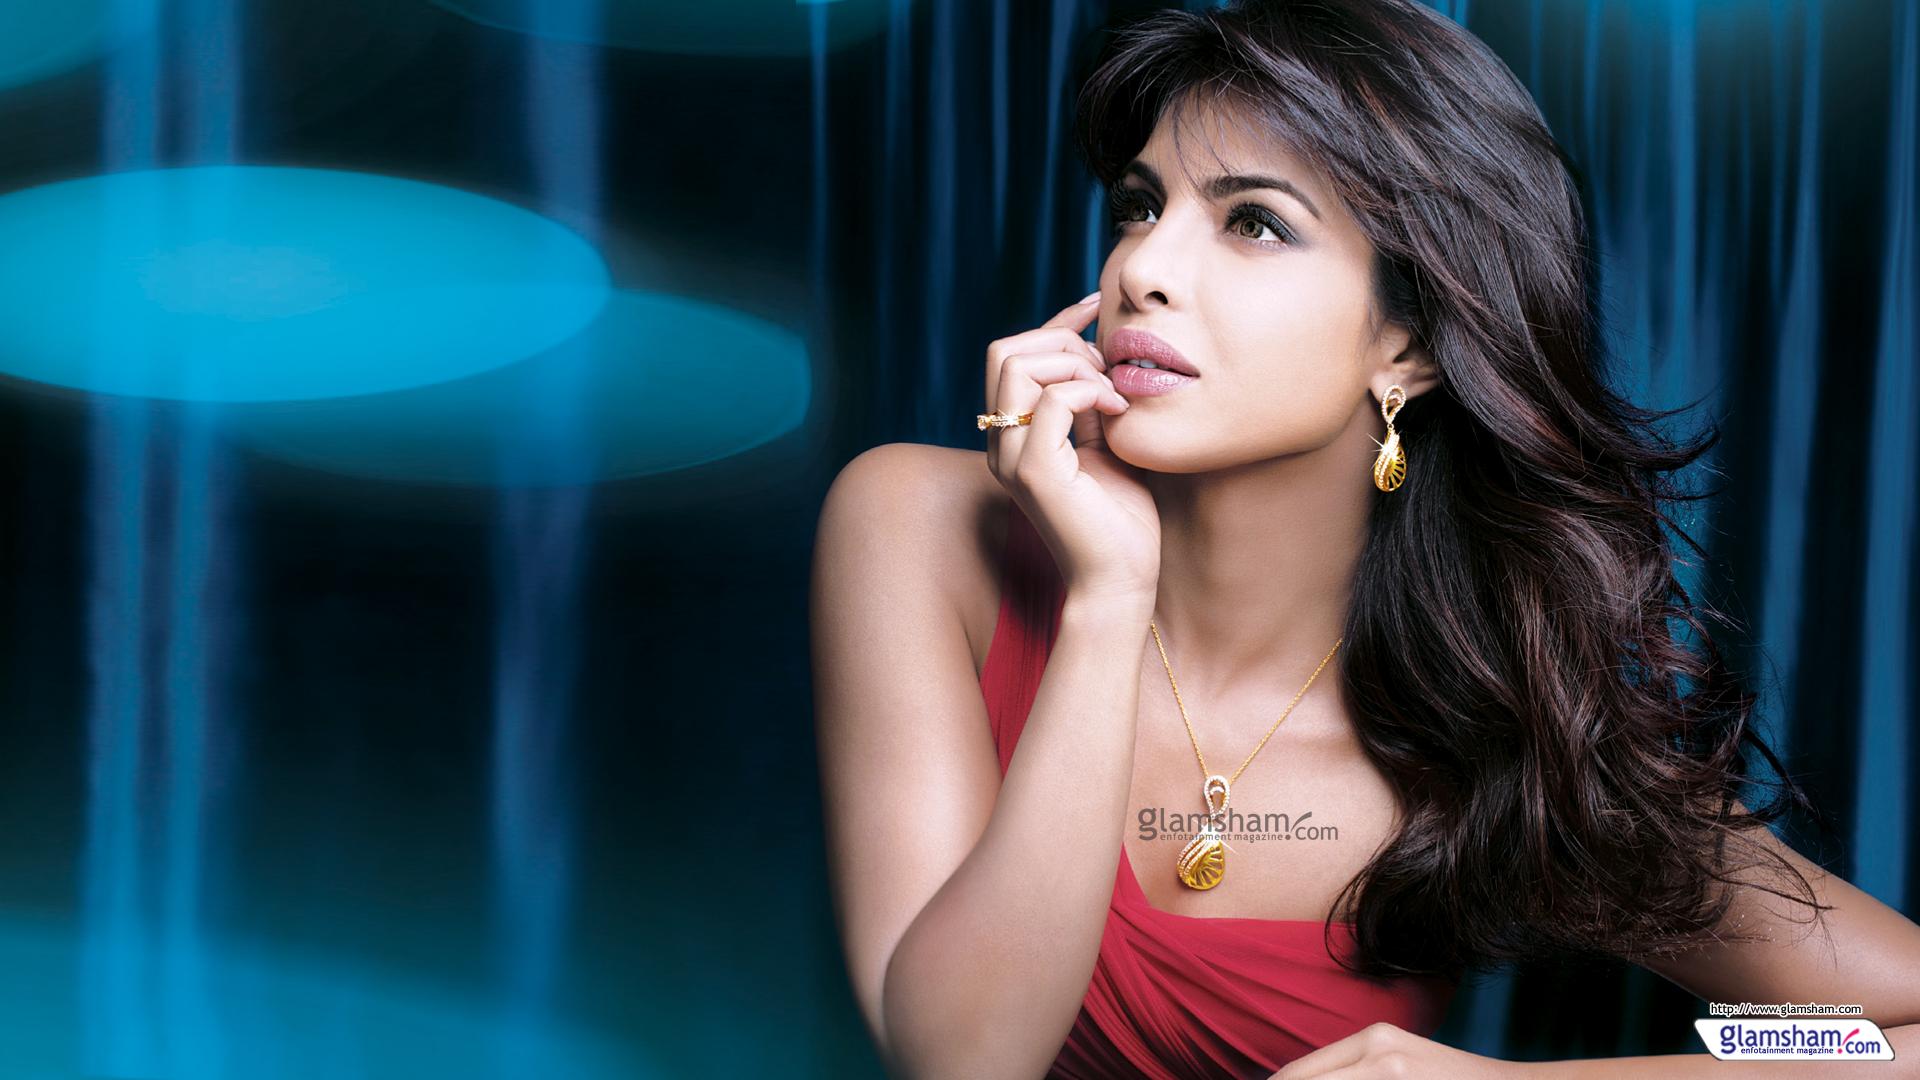 priyanka chopra hd wallpapers free download p 1920x1080 priyanka chopra hd wallpapers free